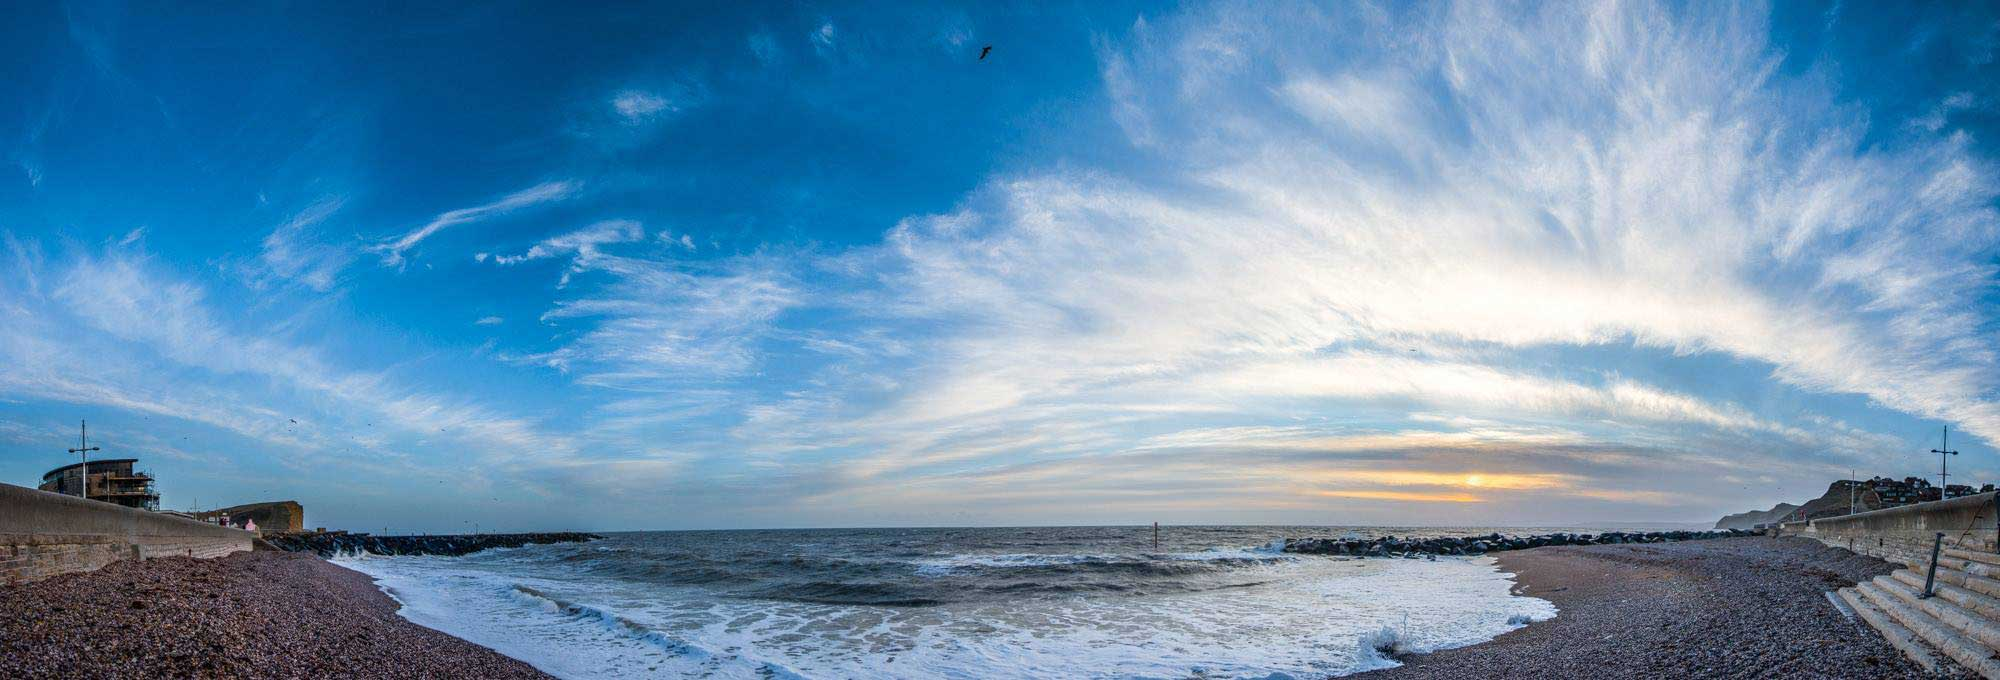 West Beach West Bay